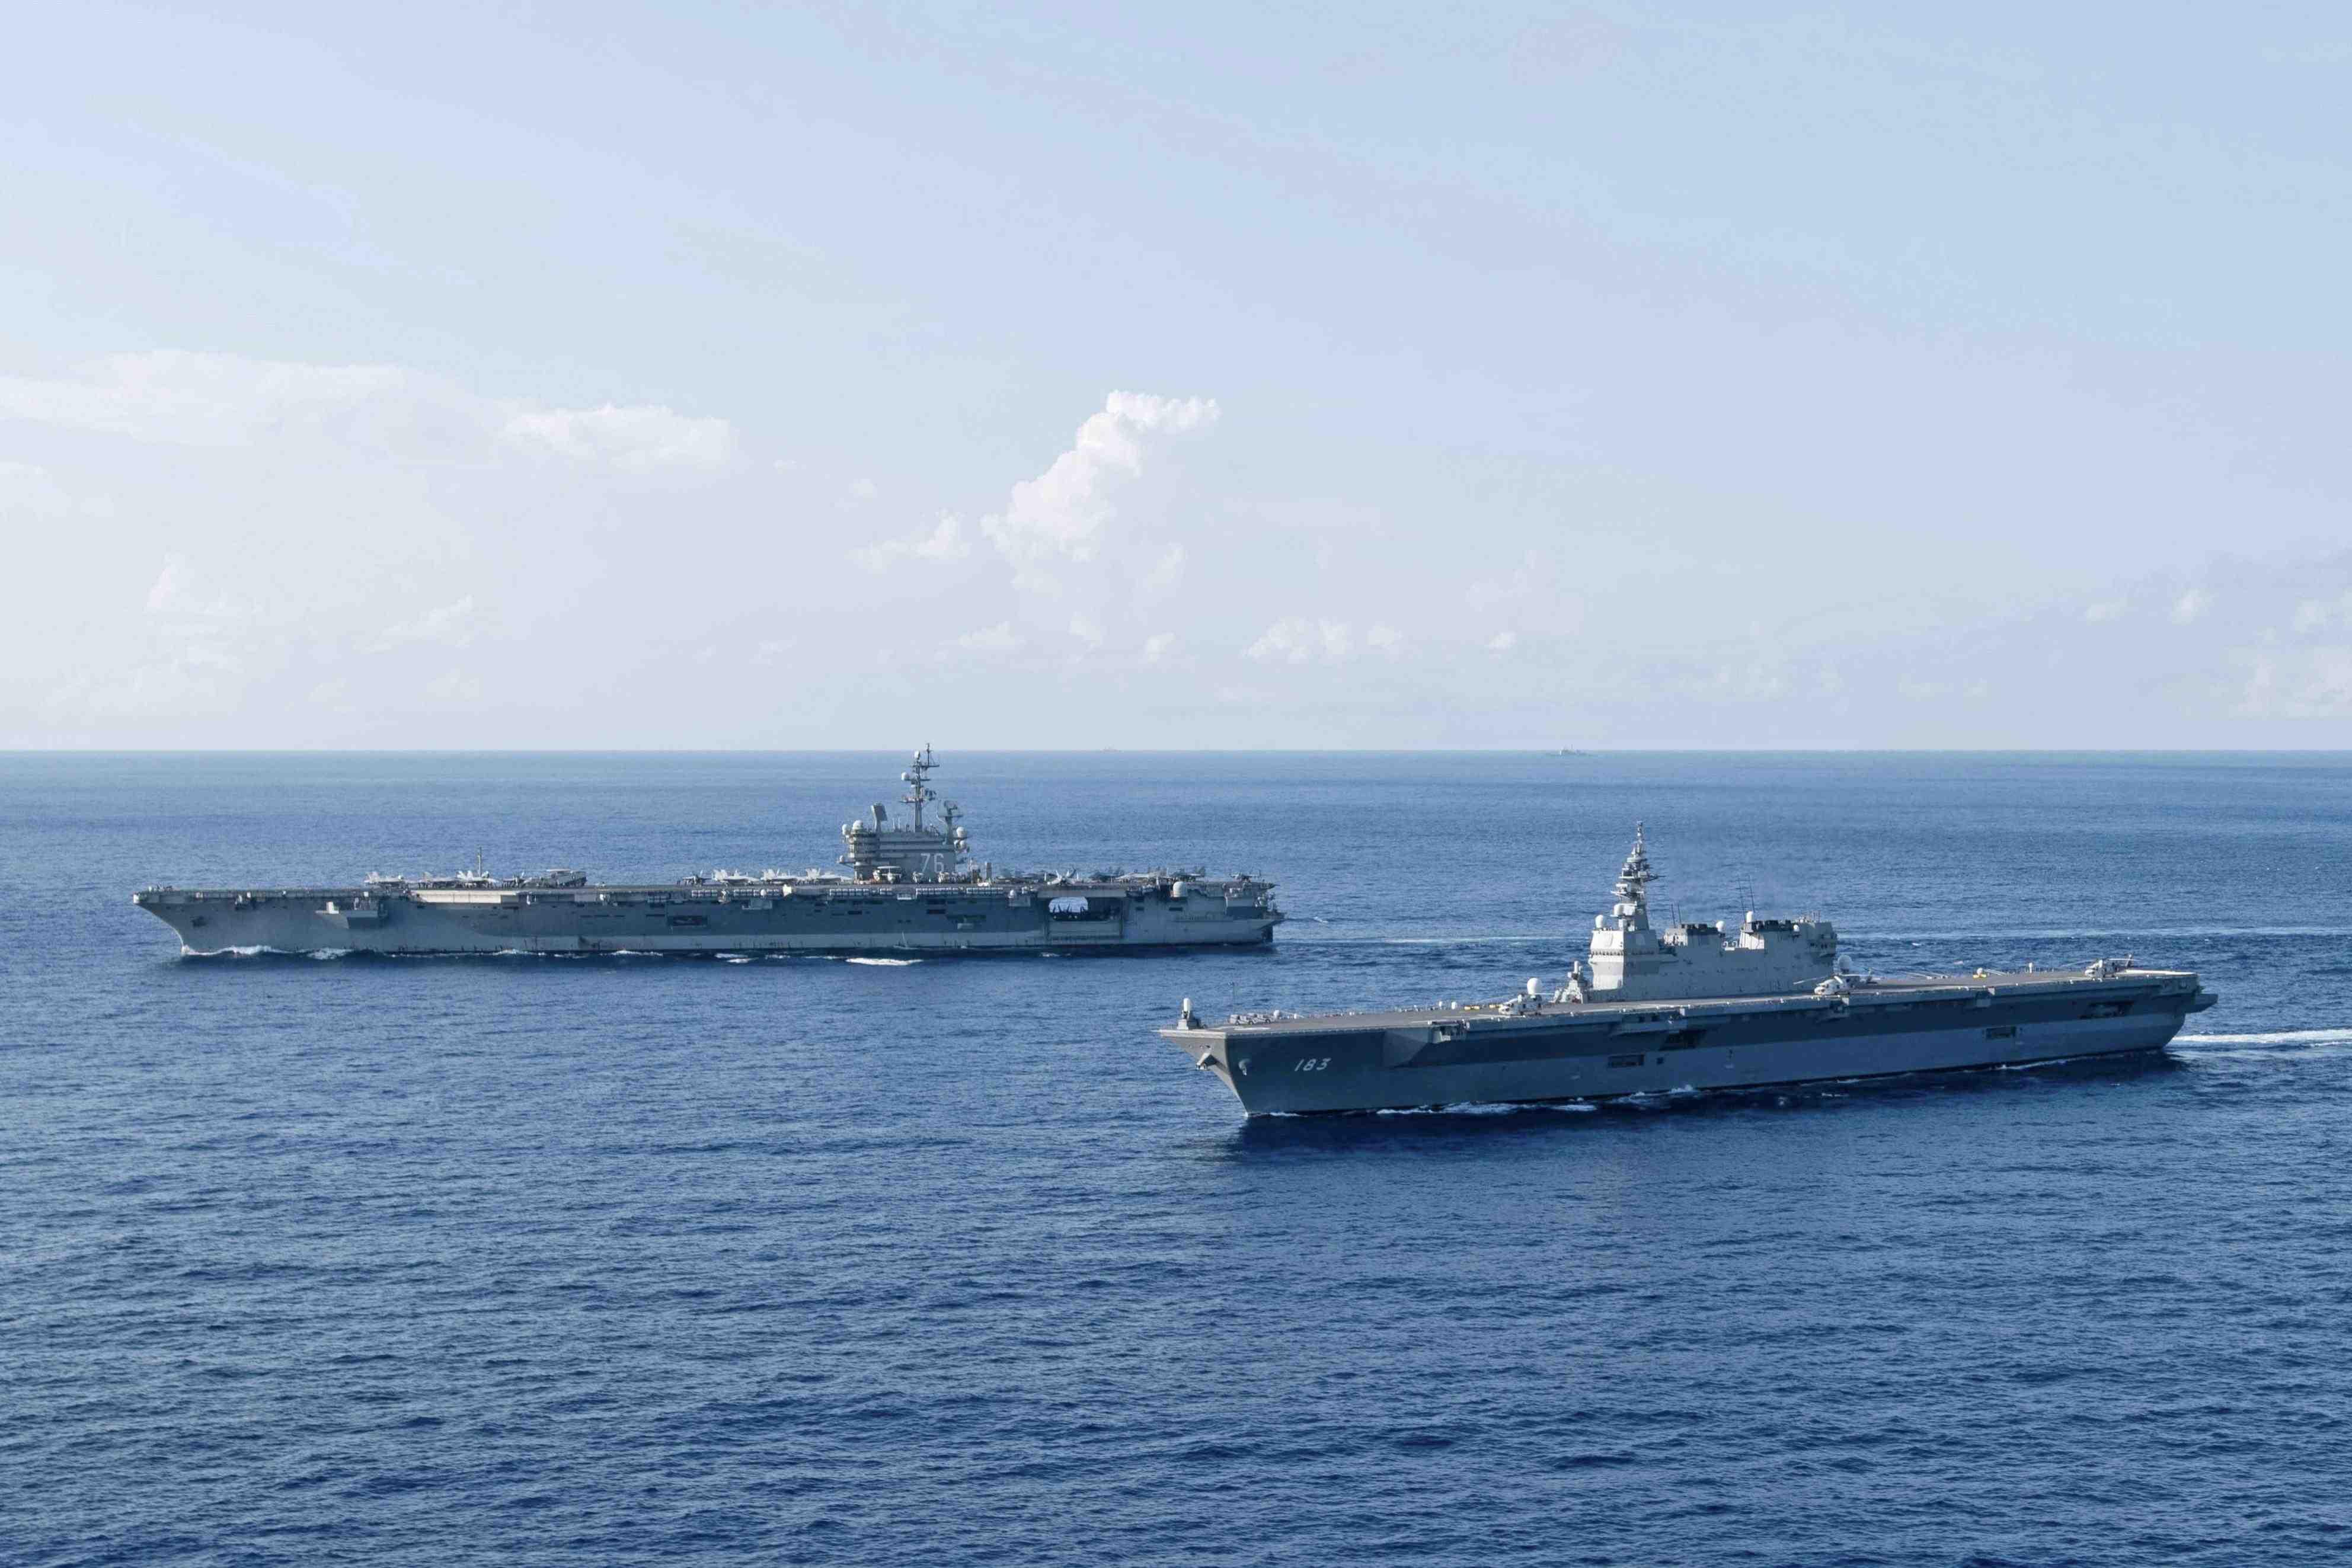 Japan, U.S. and South China Sea 012